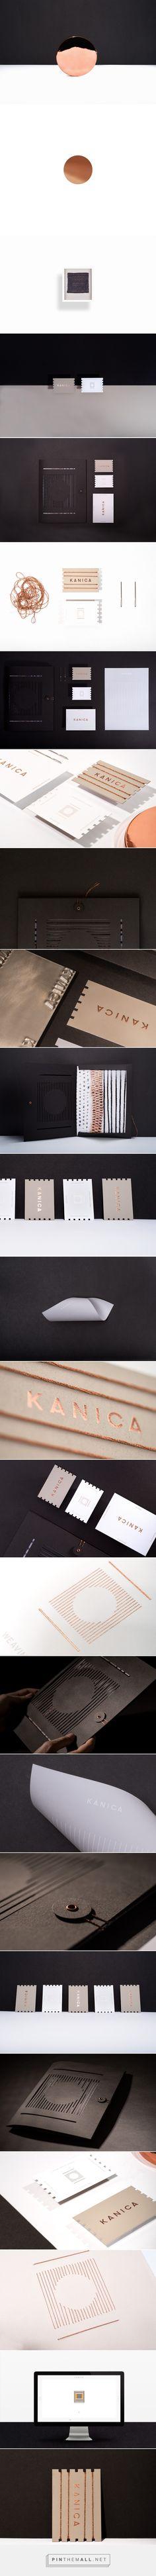 K A N I C A on Behance - created via http://pinthemall.net